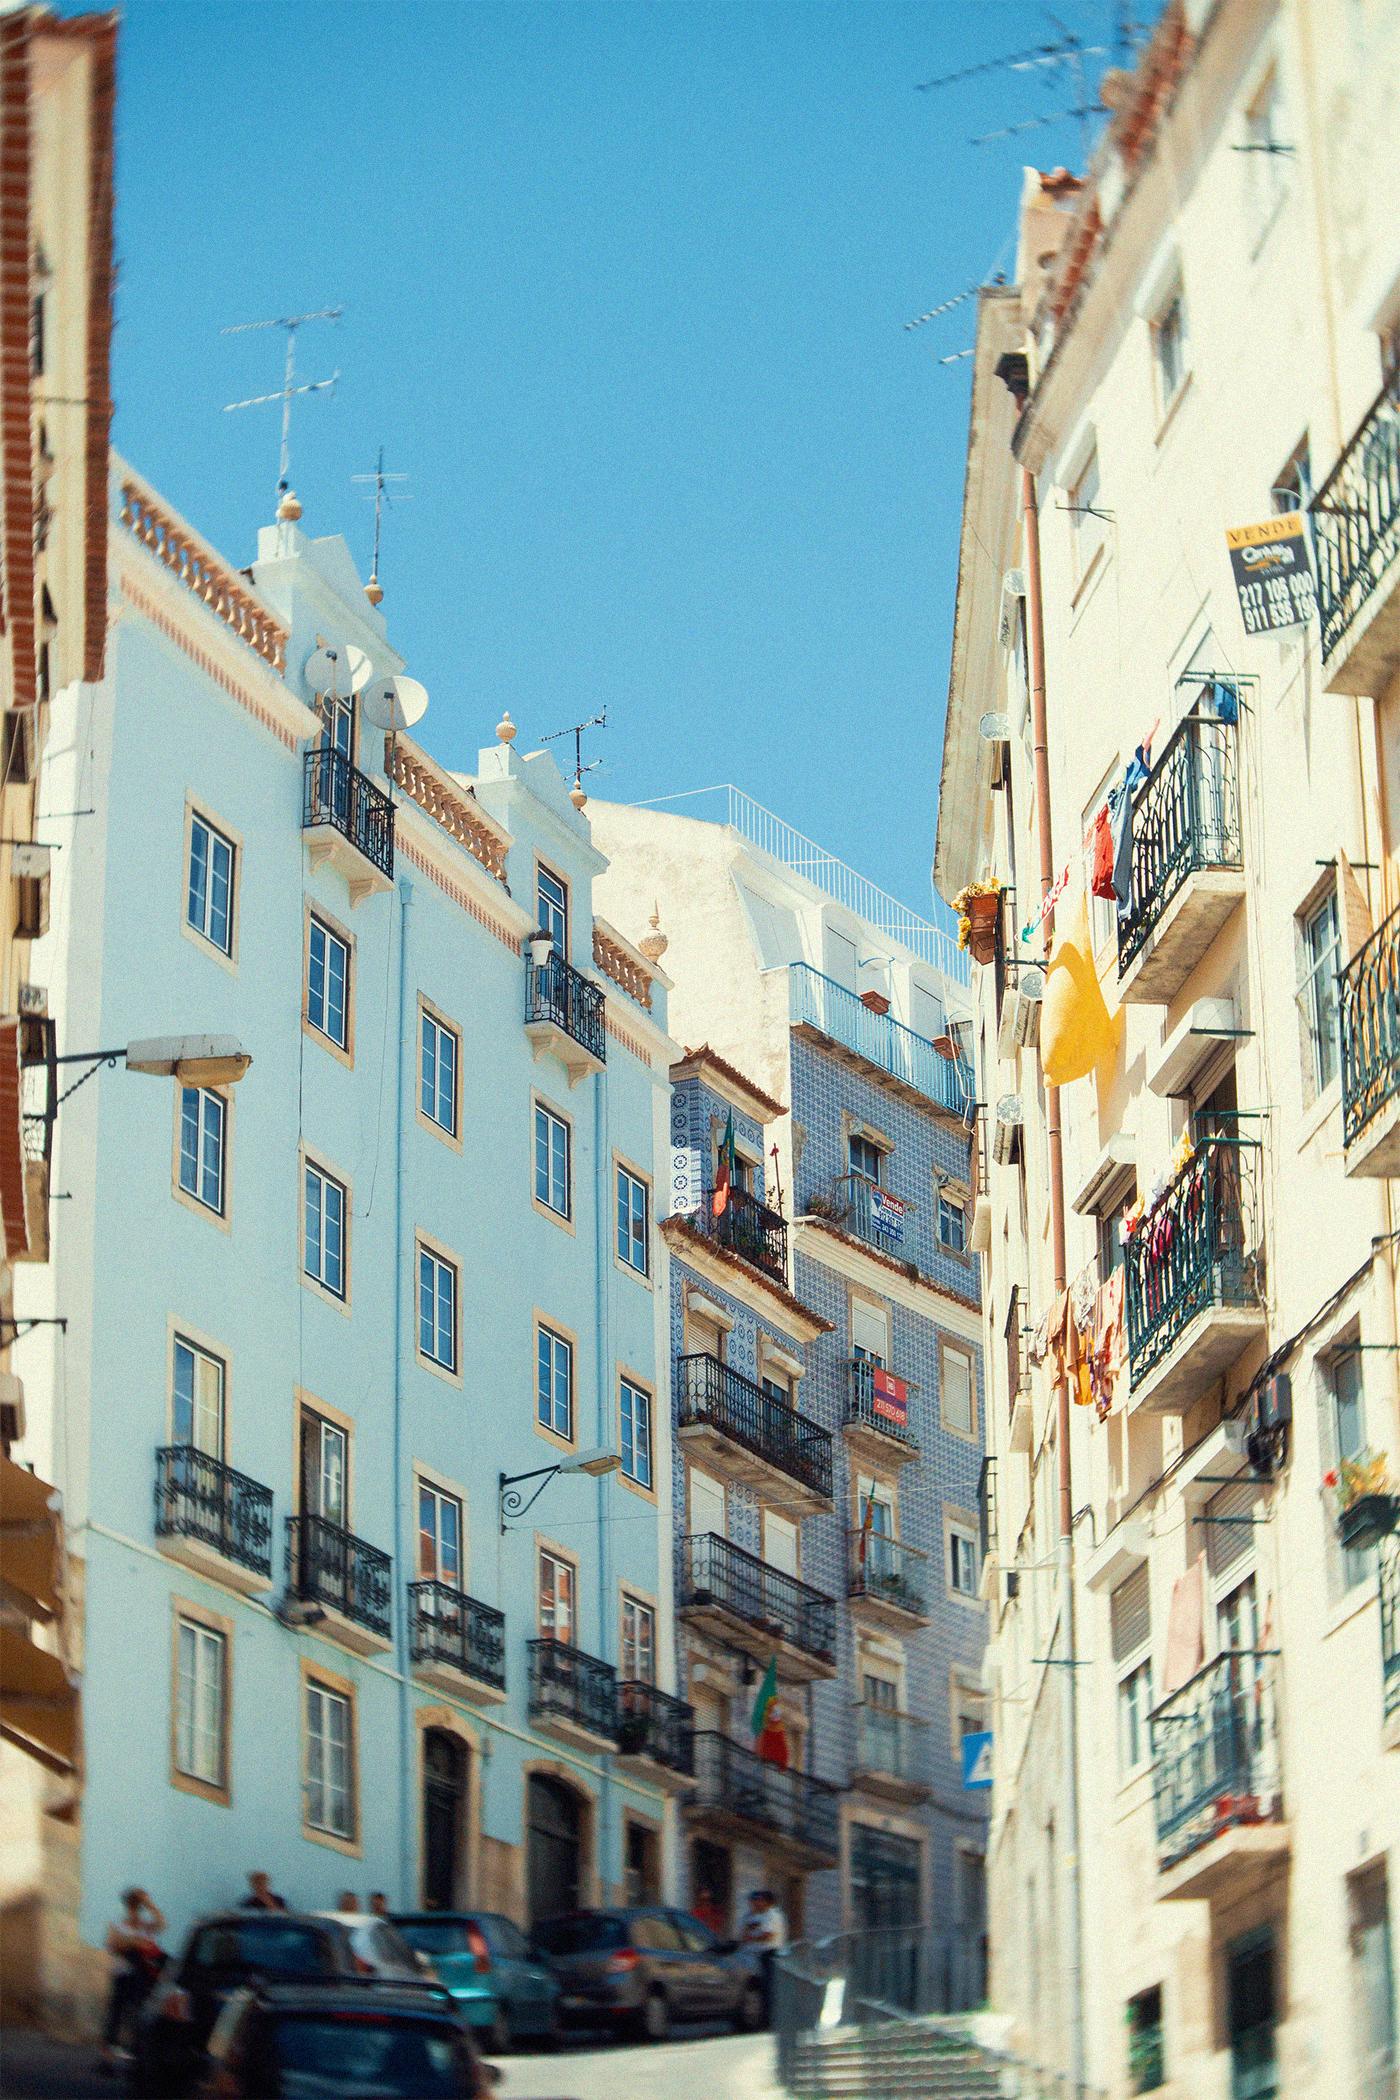 lisbon streets lissabon reisiblogi